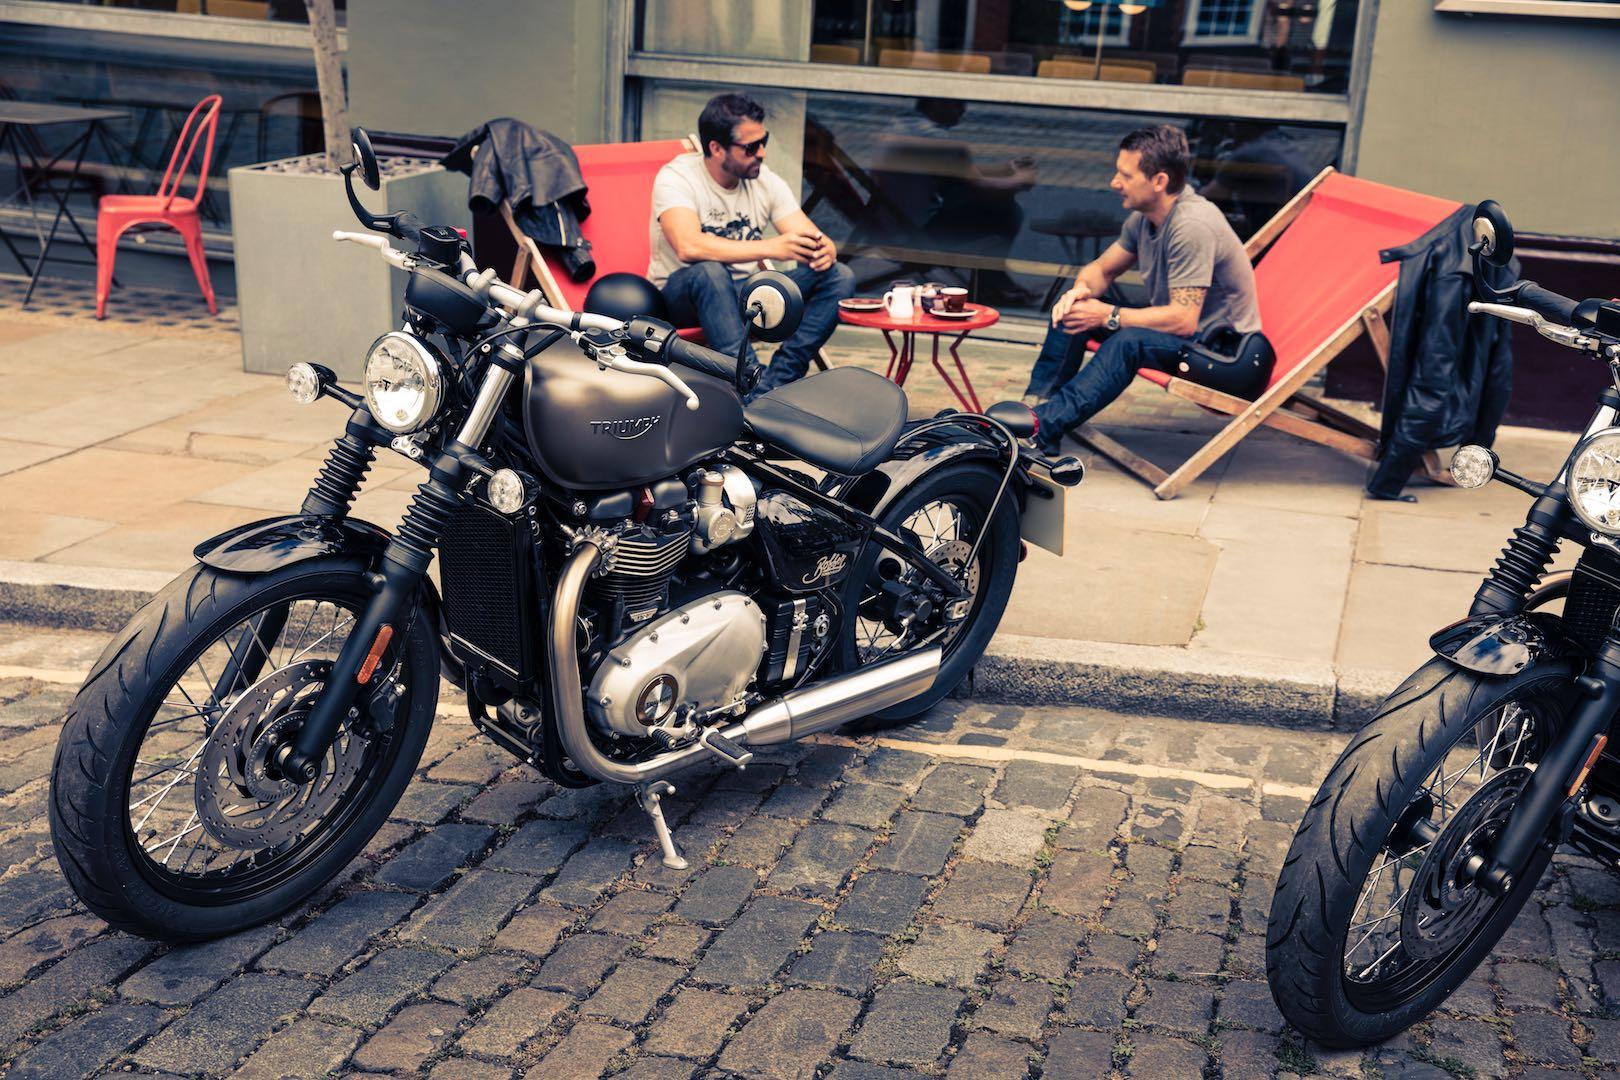 Triumph Bonneville Bobber: Most Successful Selling New Model